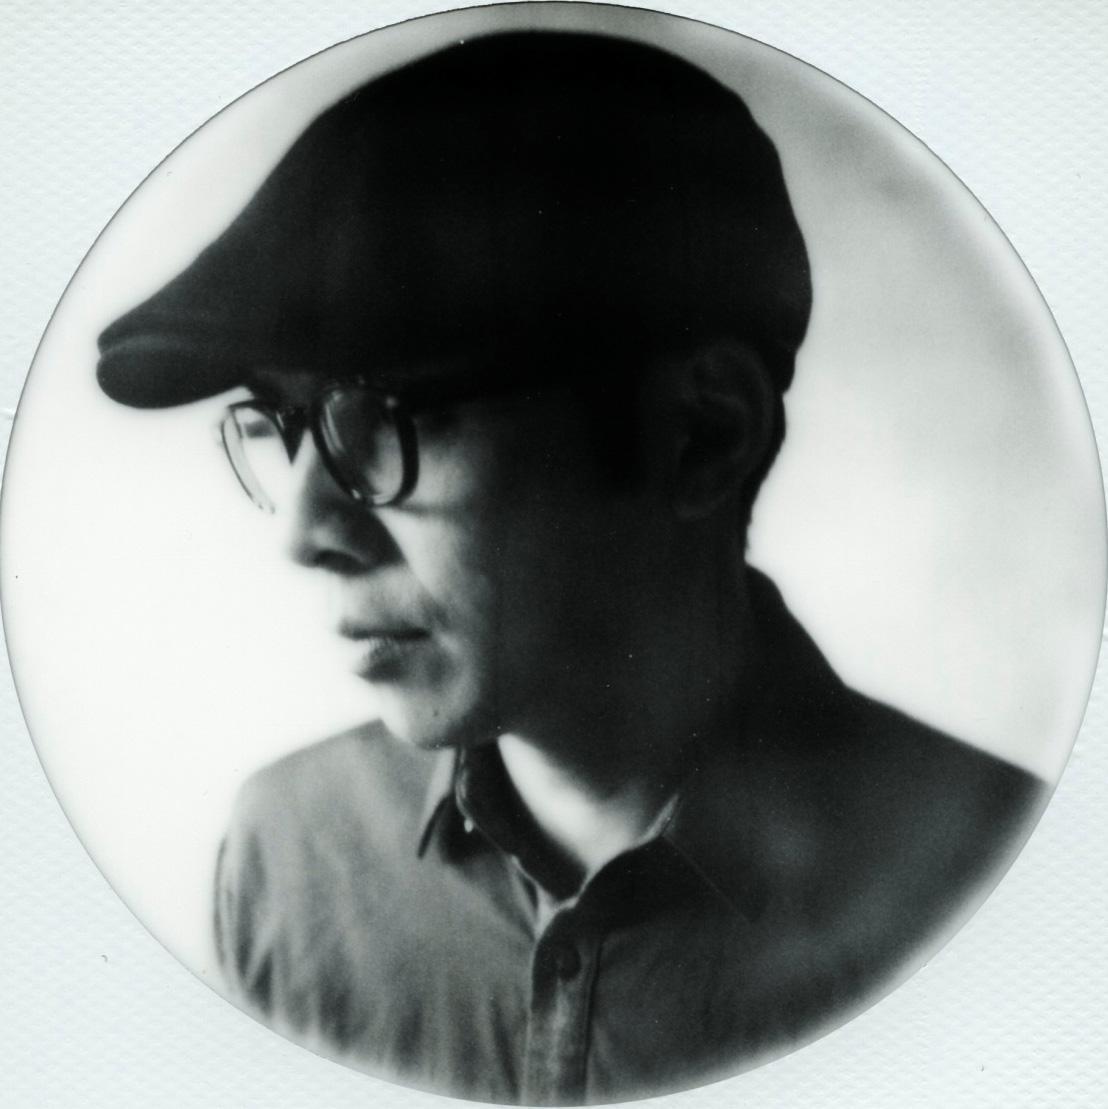 Eddy Hui